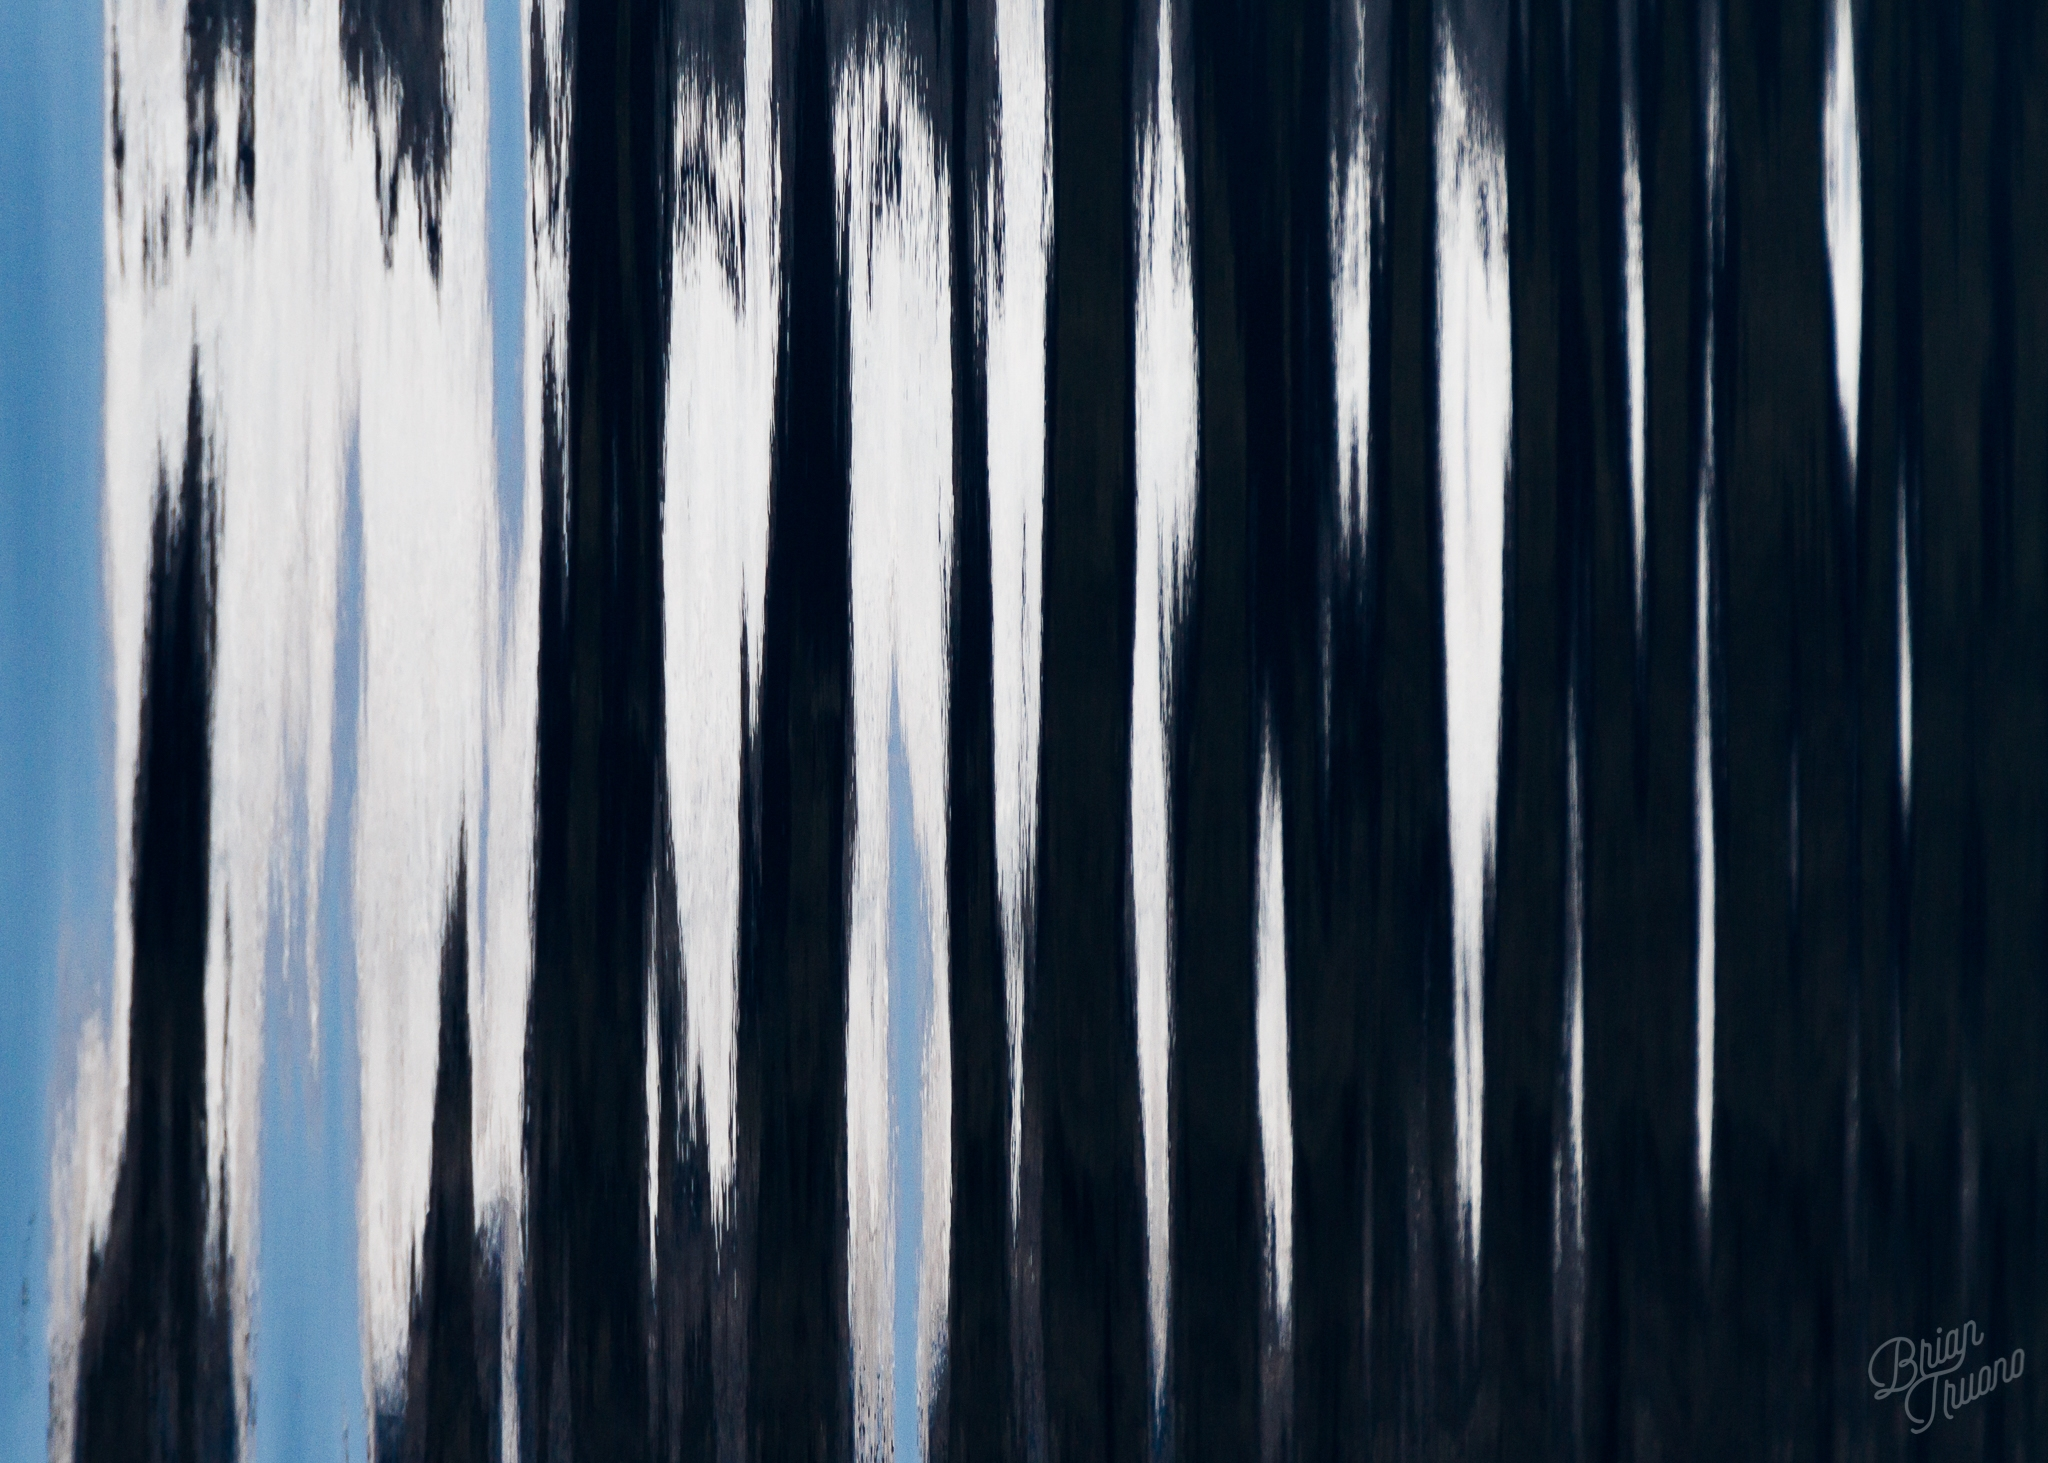 Evanescent_BTruono_fbgp.jpg